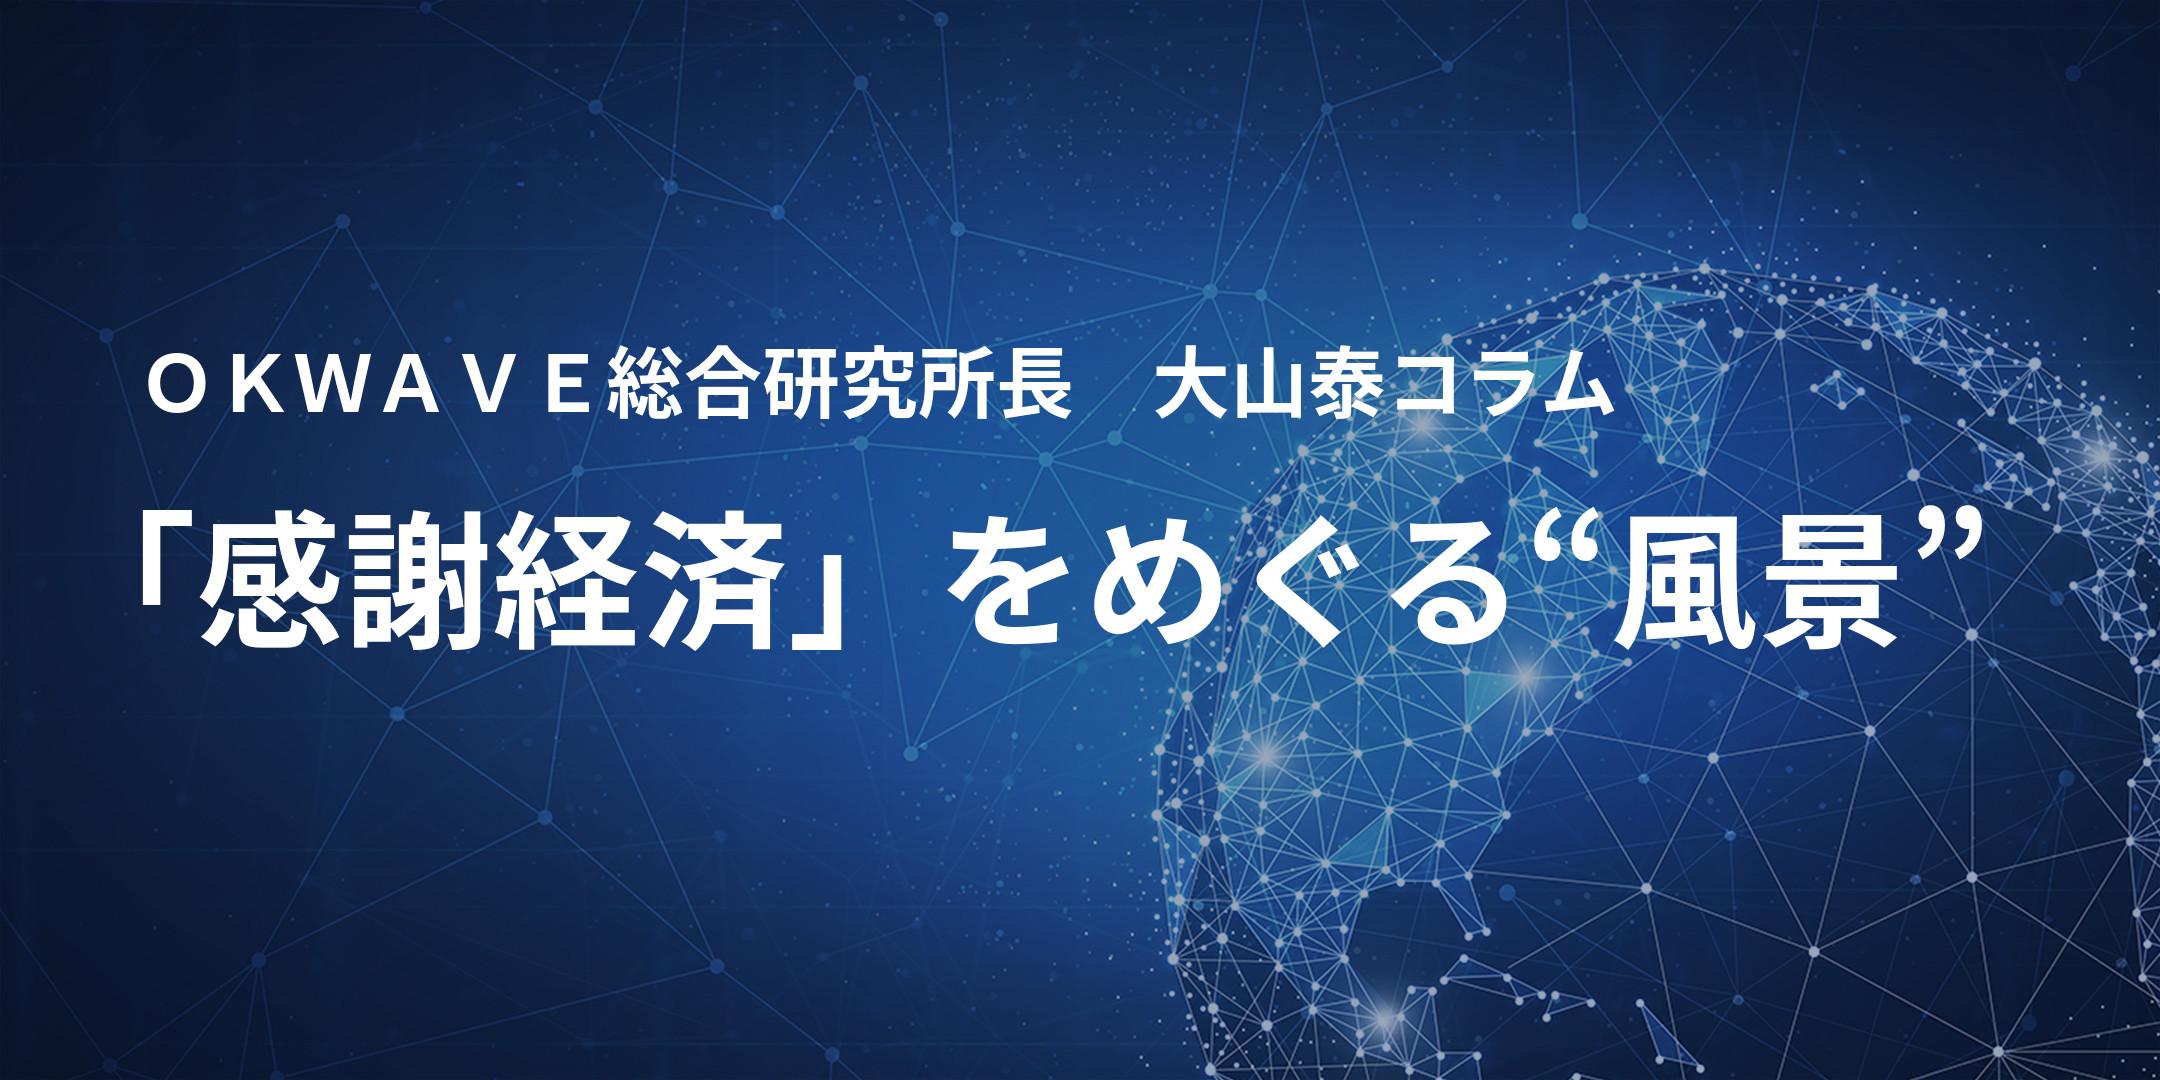 OKWAVE総合研究所長 大山泰コラム